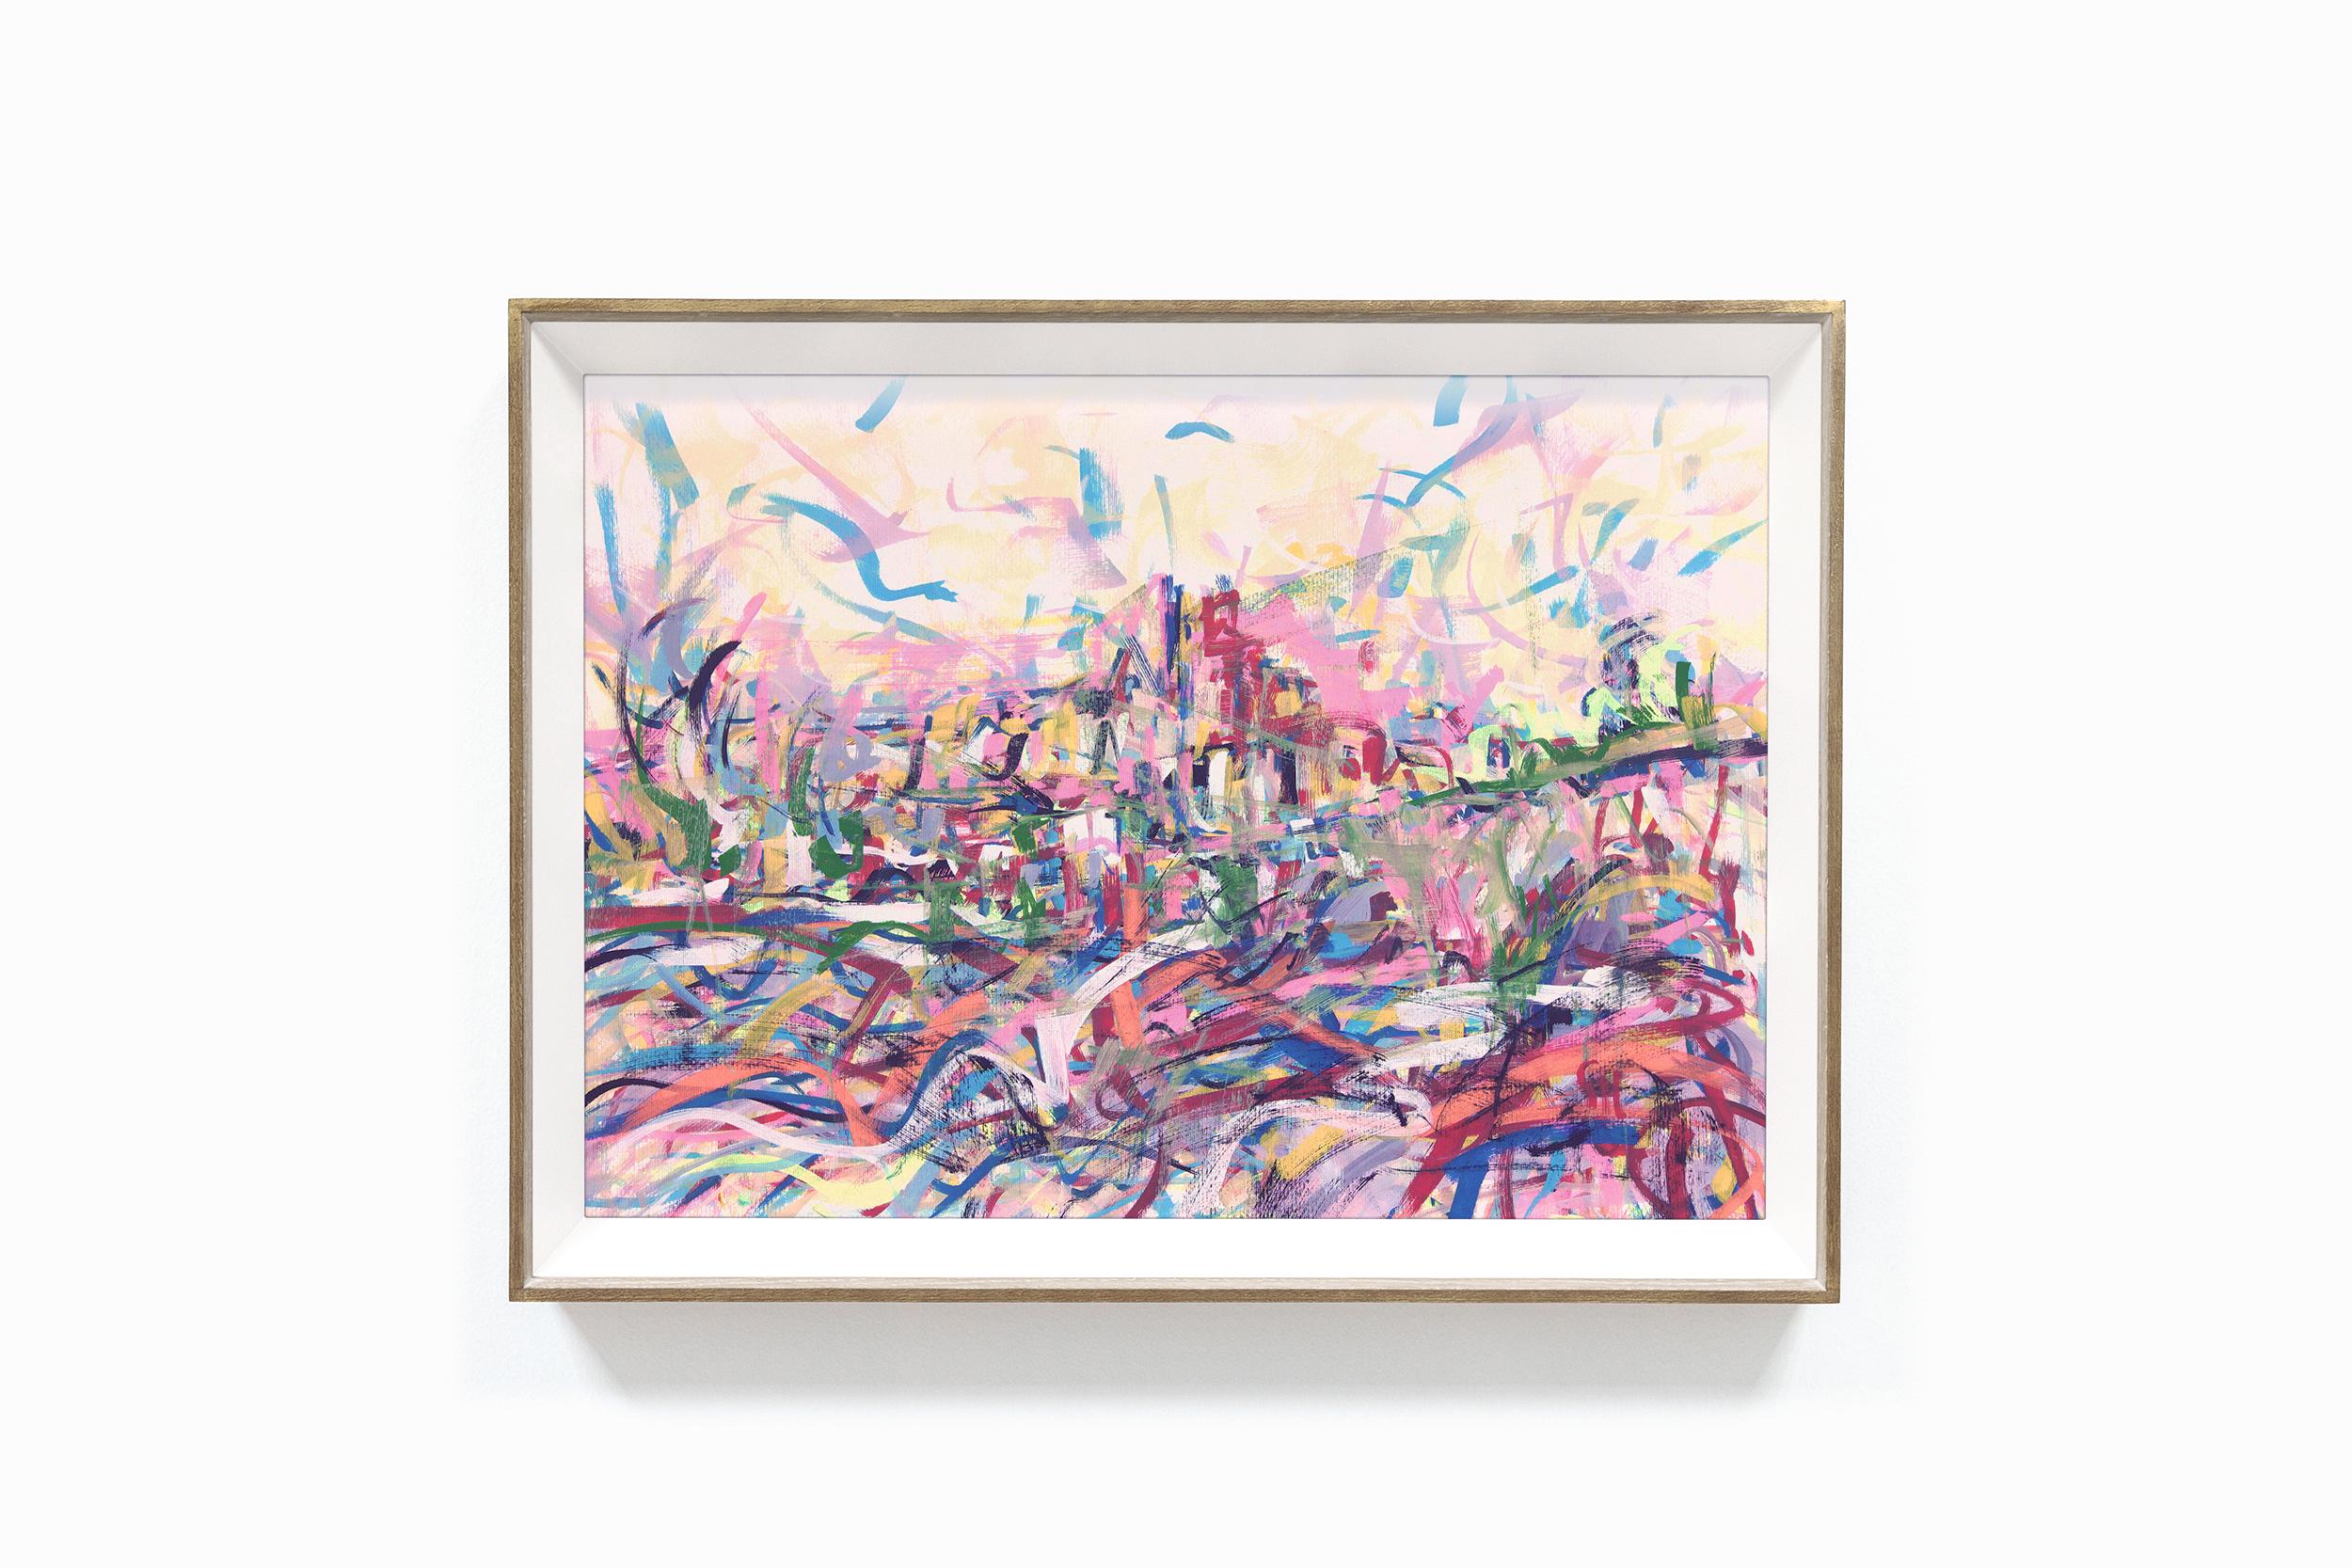 bonjourmolotov+Desniveis+Illustration+Ilustracao+painting+pintura+acrylic+acrílico+canvas+tela+paper+cardboard+mdf+Andre+Gigante+12N4.jpg